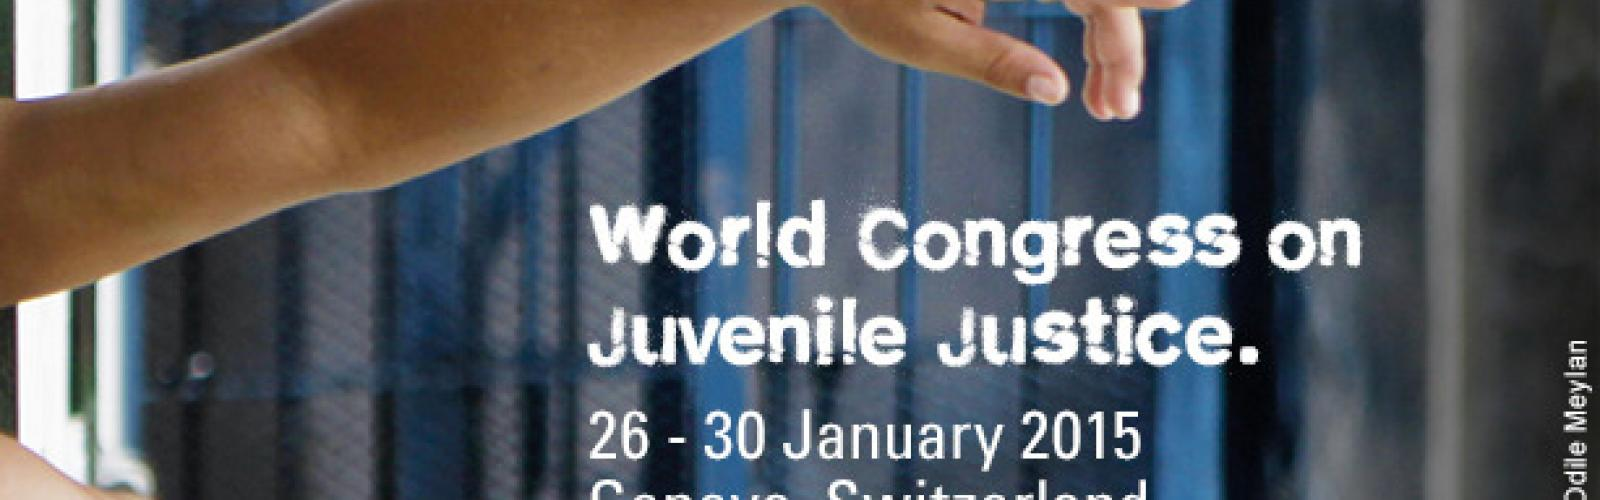 WORLD CONGRESS JUVENILE JUSTICE GENEVA 2015